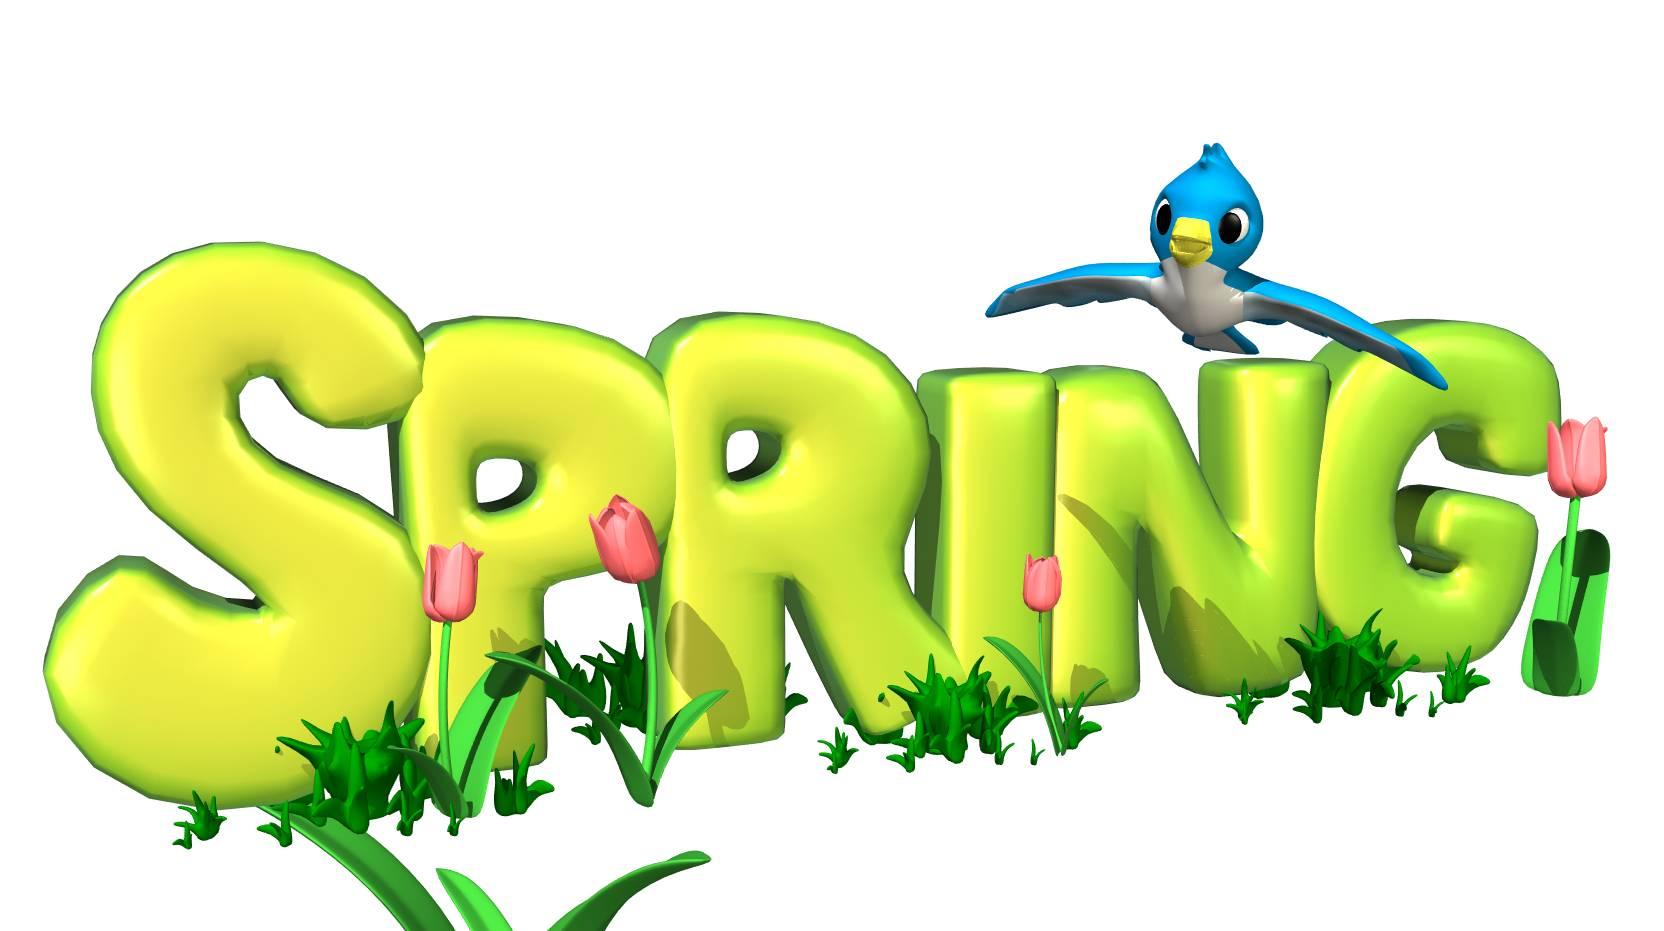 1664x931 Animated Springtime Clip Art Danaami2 Top